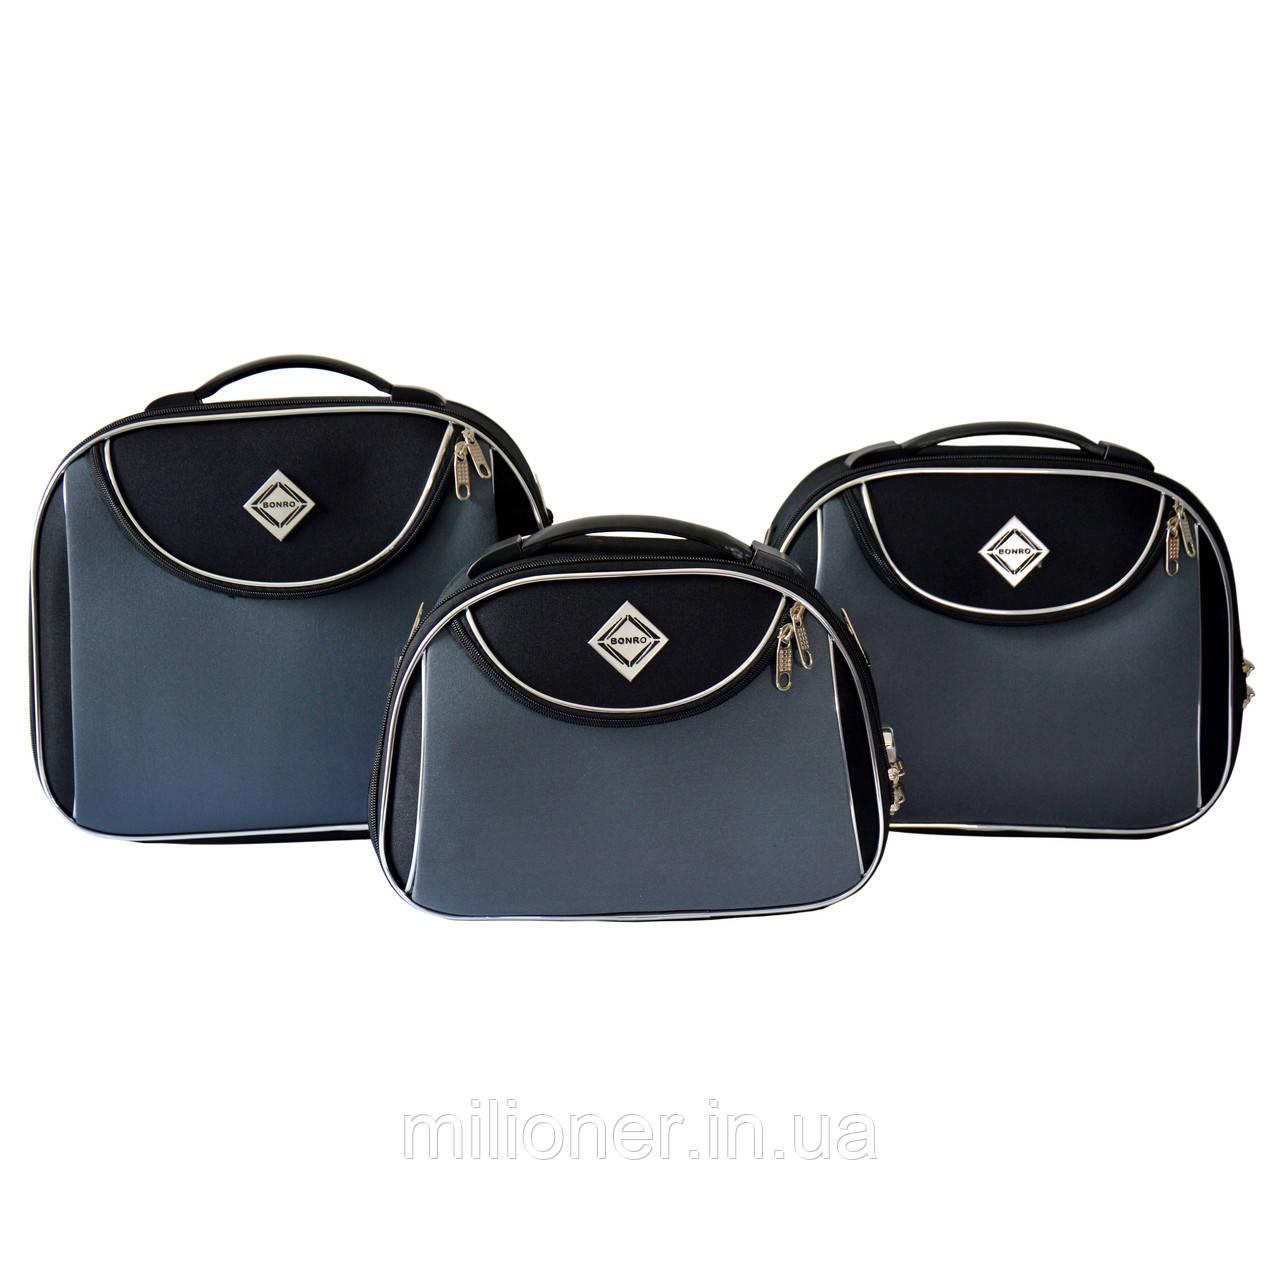 Сумка кейс саквояж 3в1 Bonro Style черно-серый